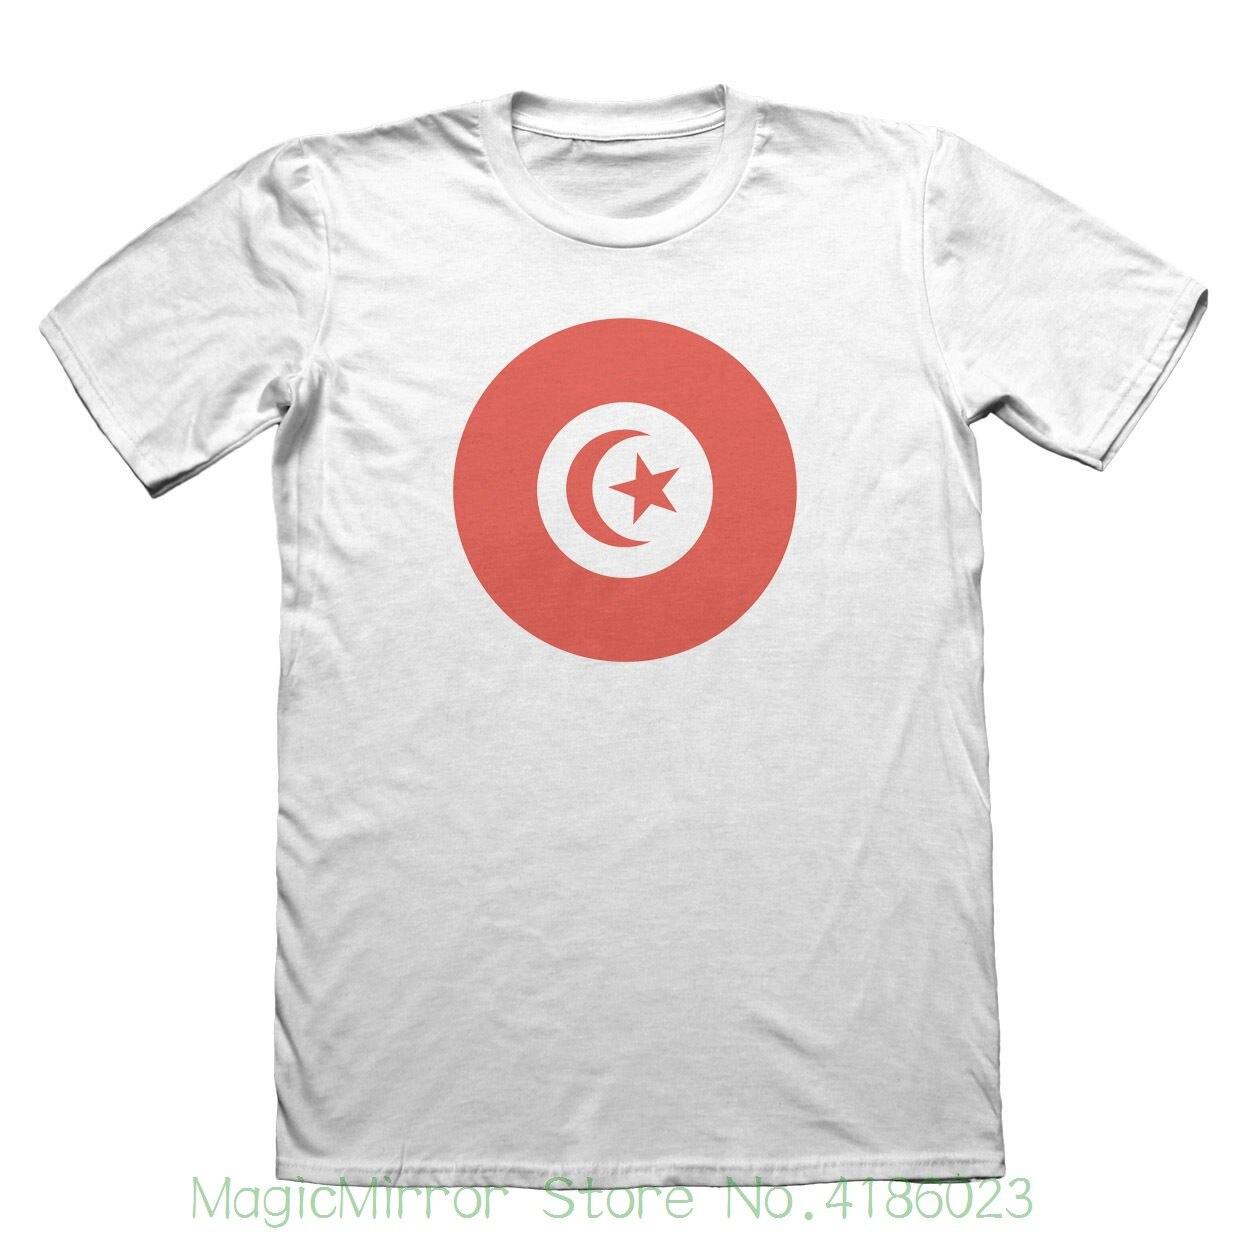 Tunisia Flag Design T-shirt - Mens Fathers Day Christmas #9123 Cotton T-shirt Fashion T Shirt